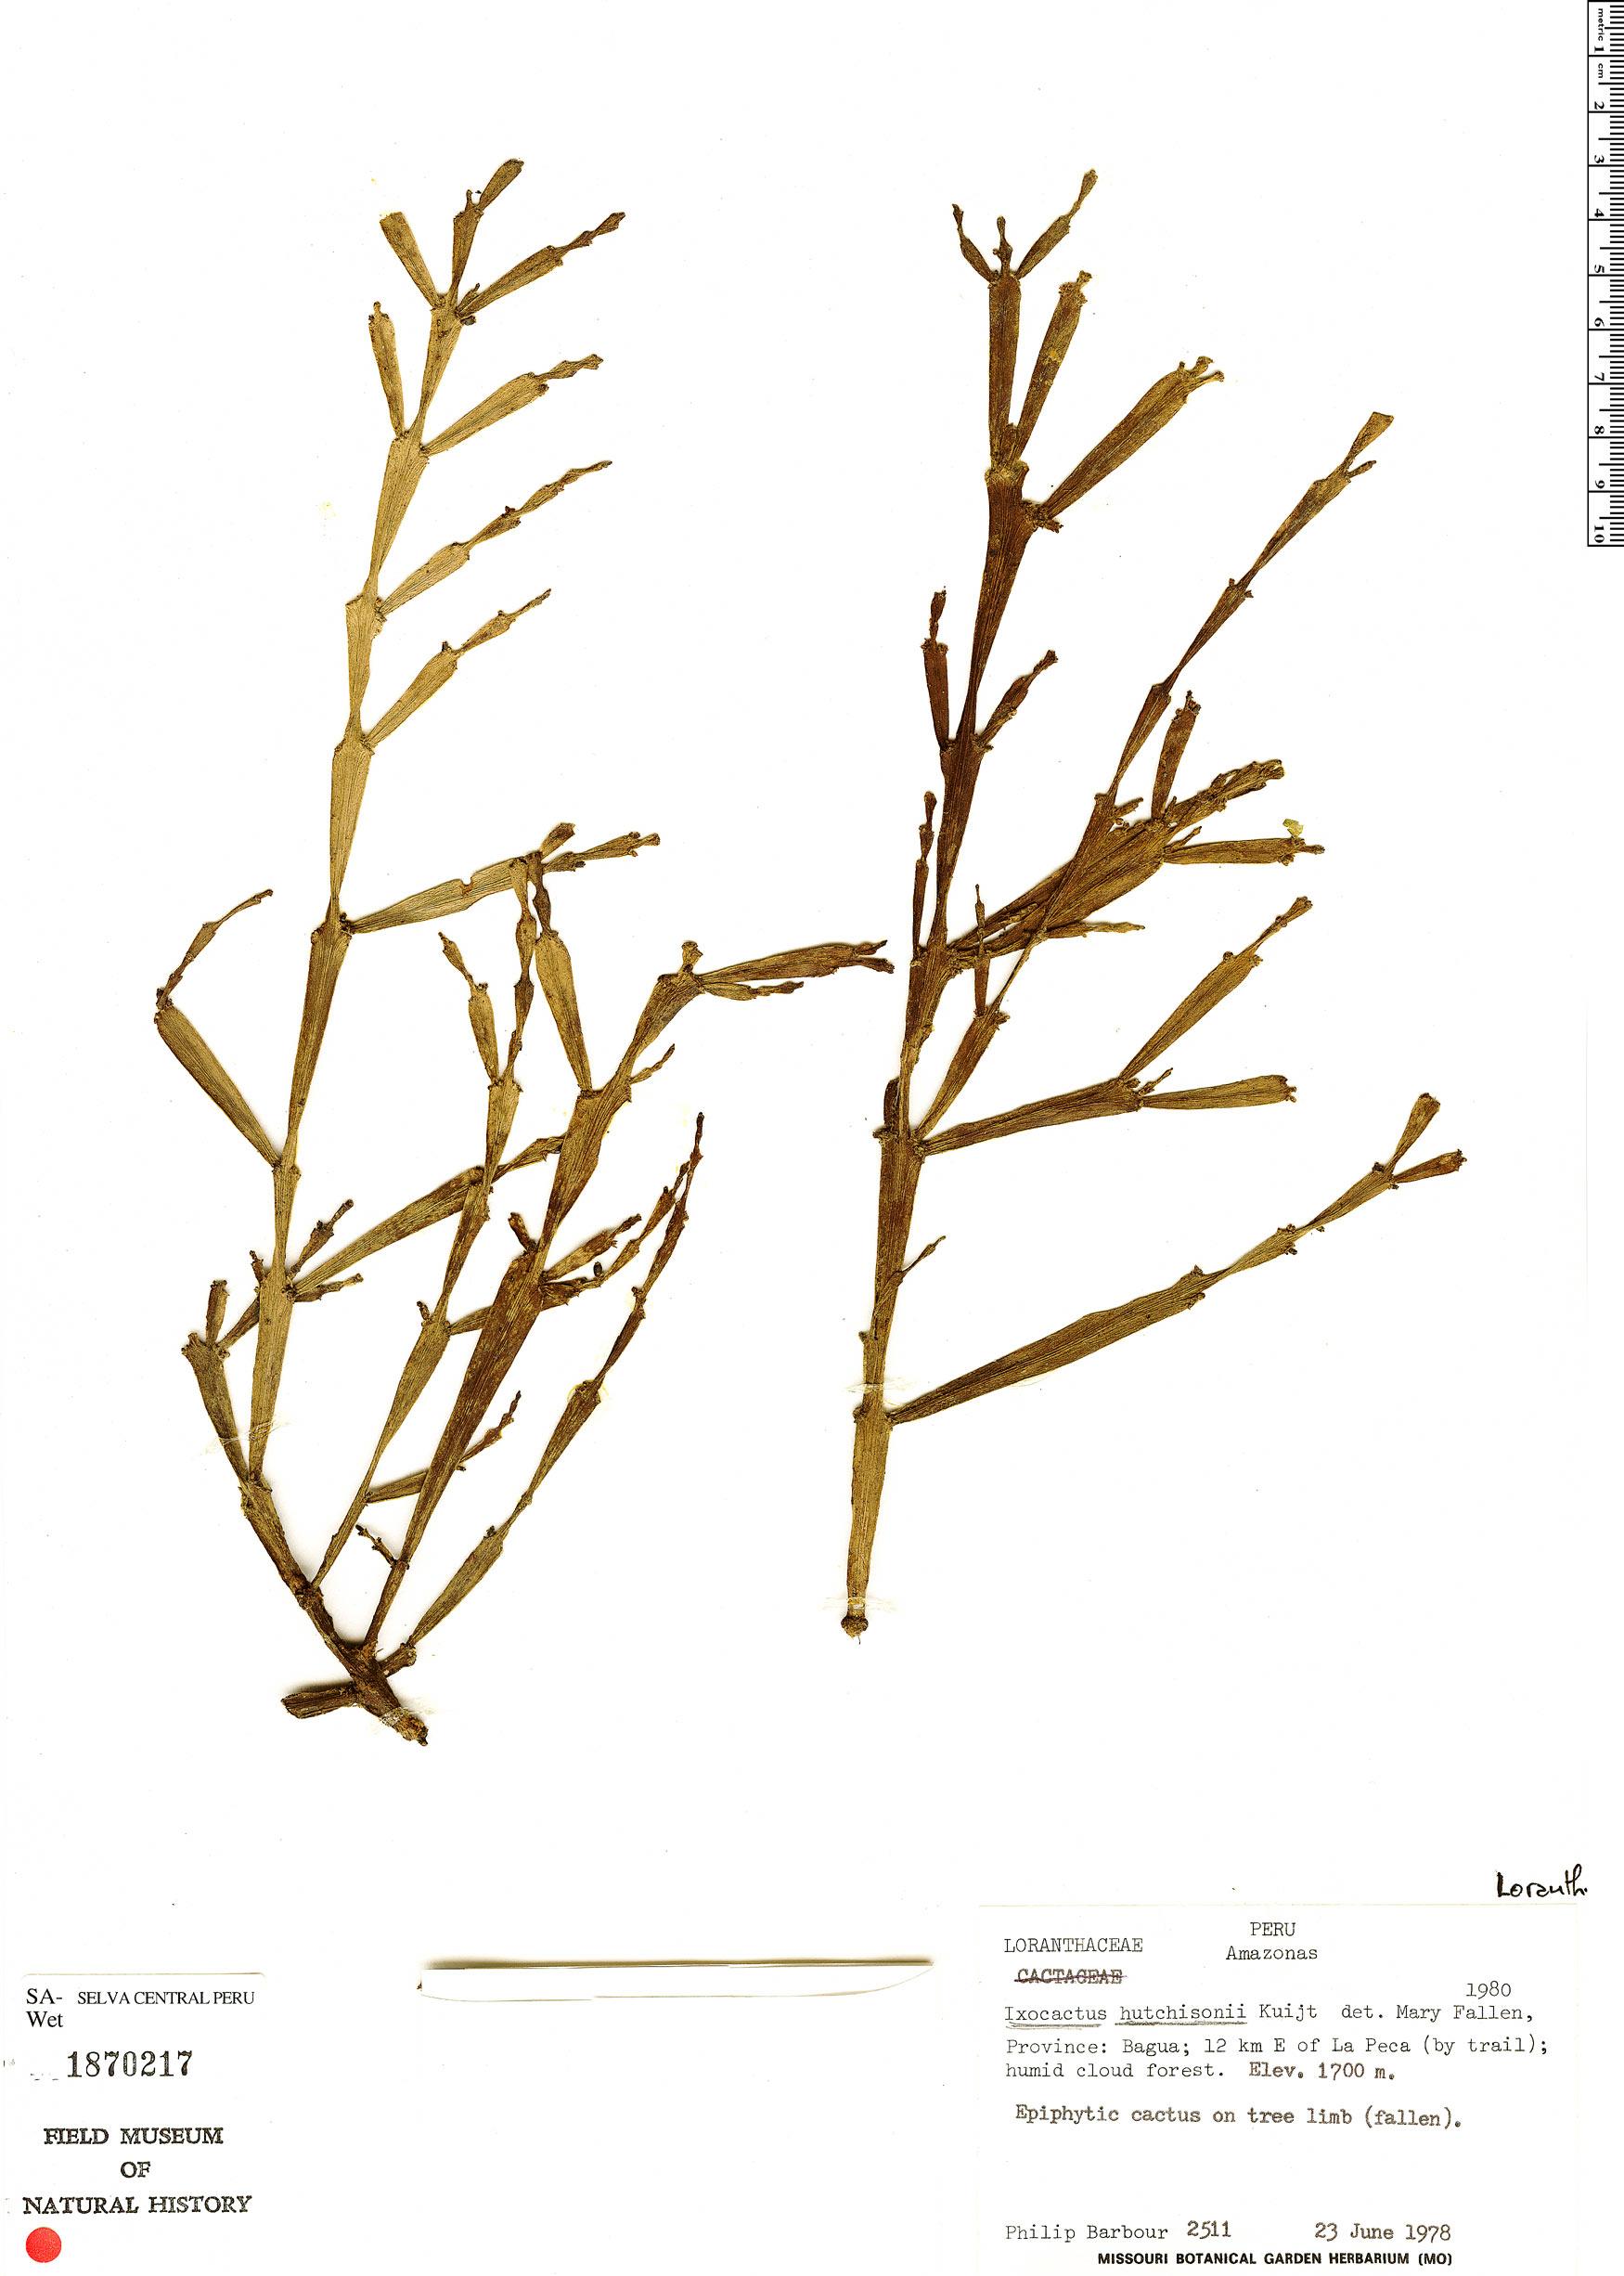 Specimen: Phthirusa hutchisonii